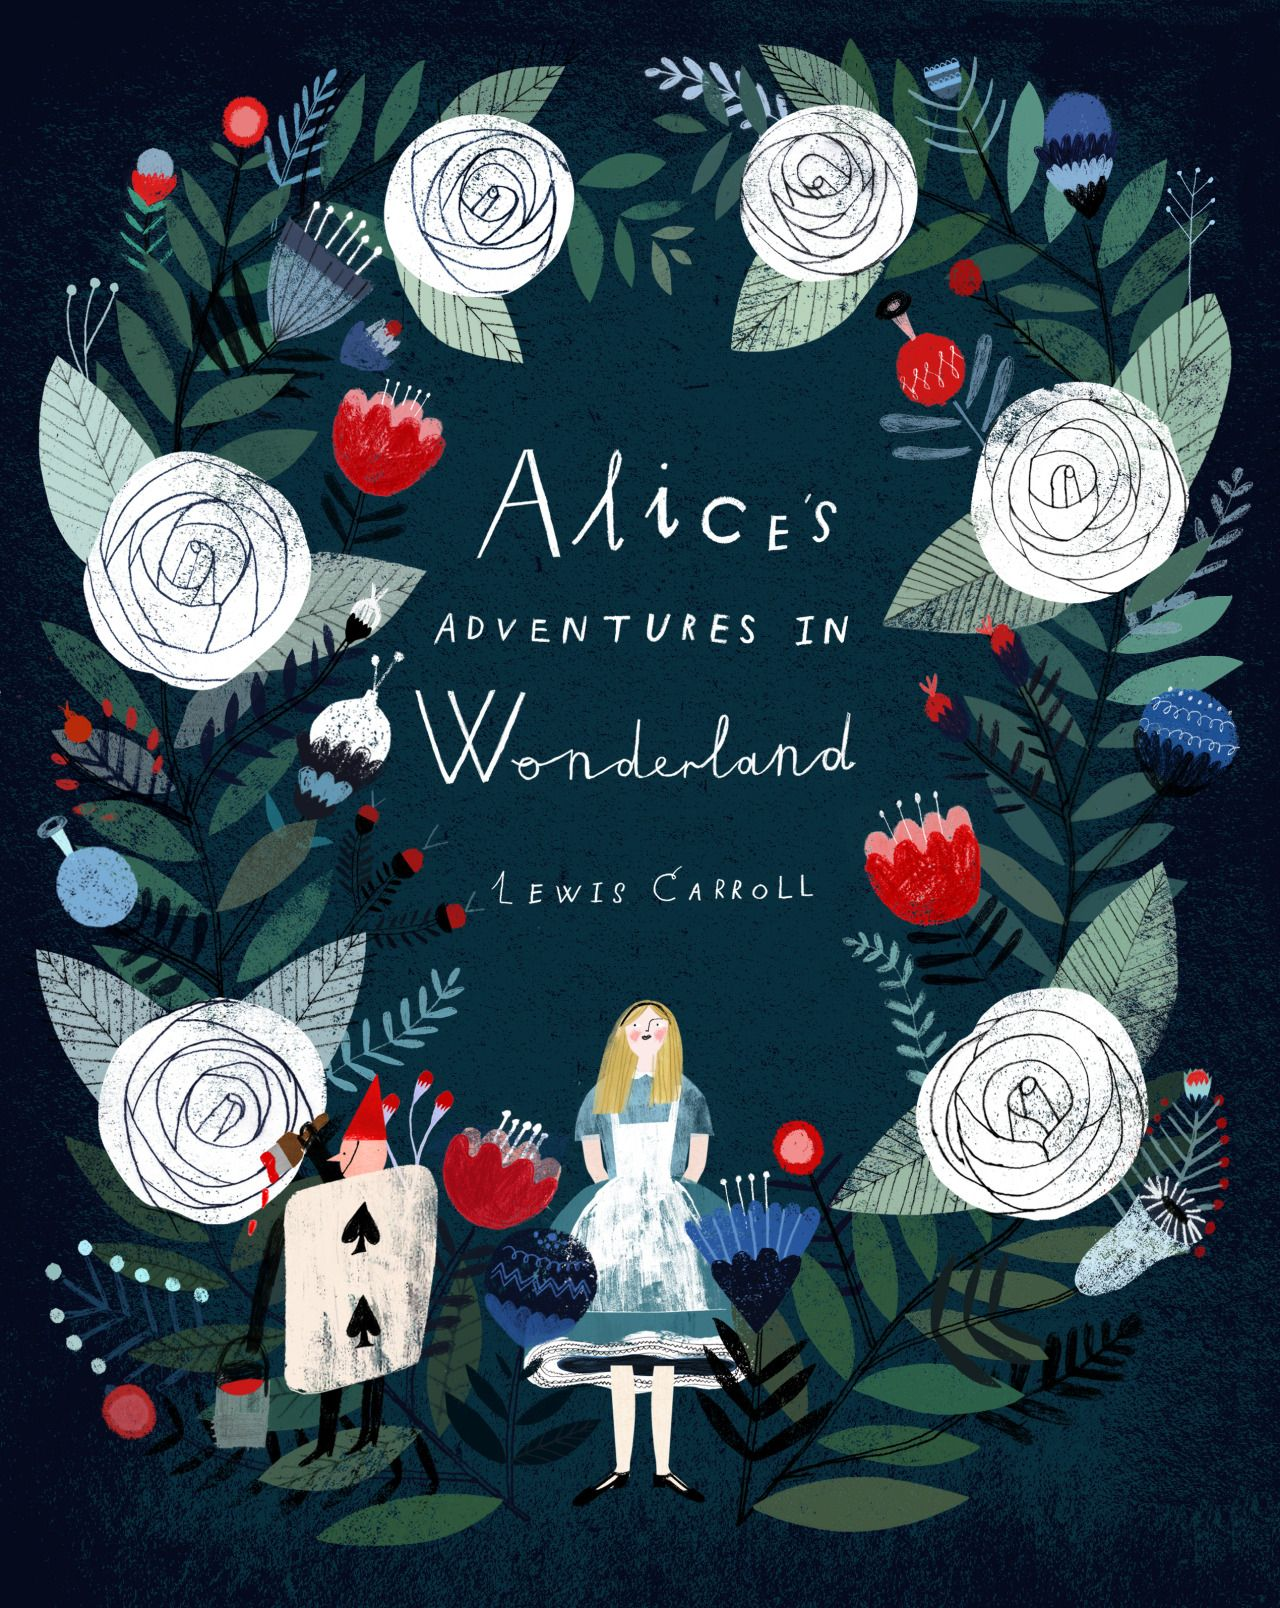 Alice Adventures in Wonderland Book Cover